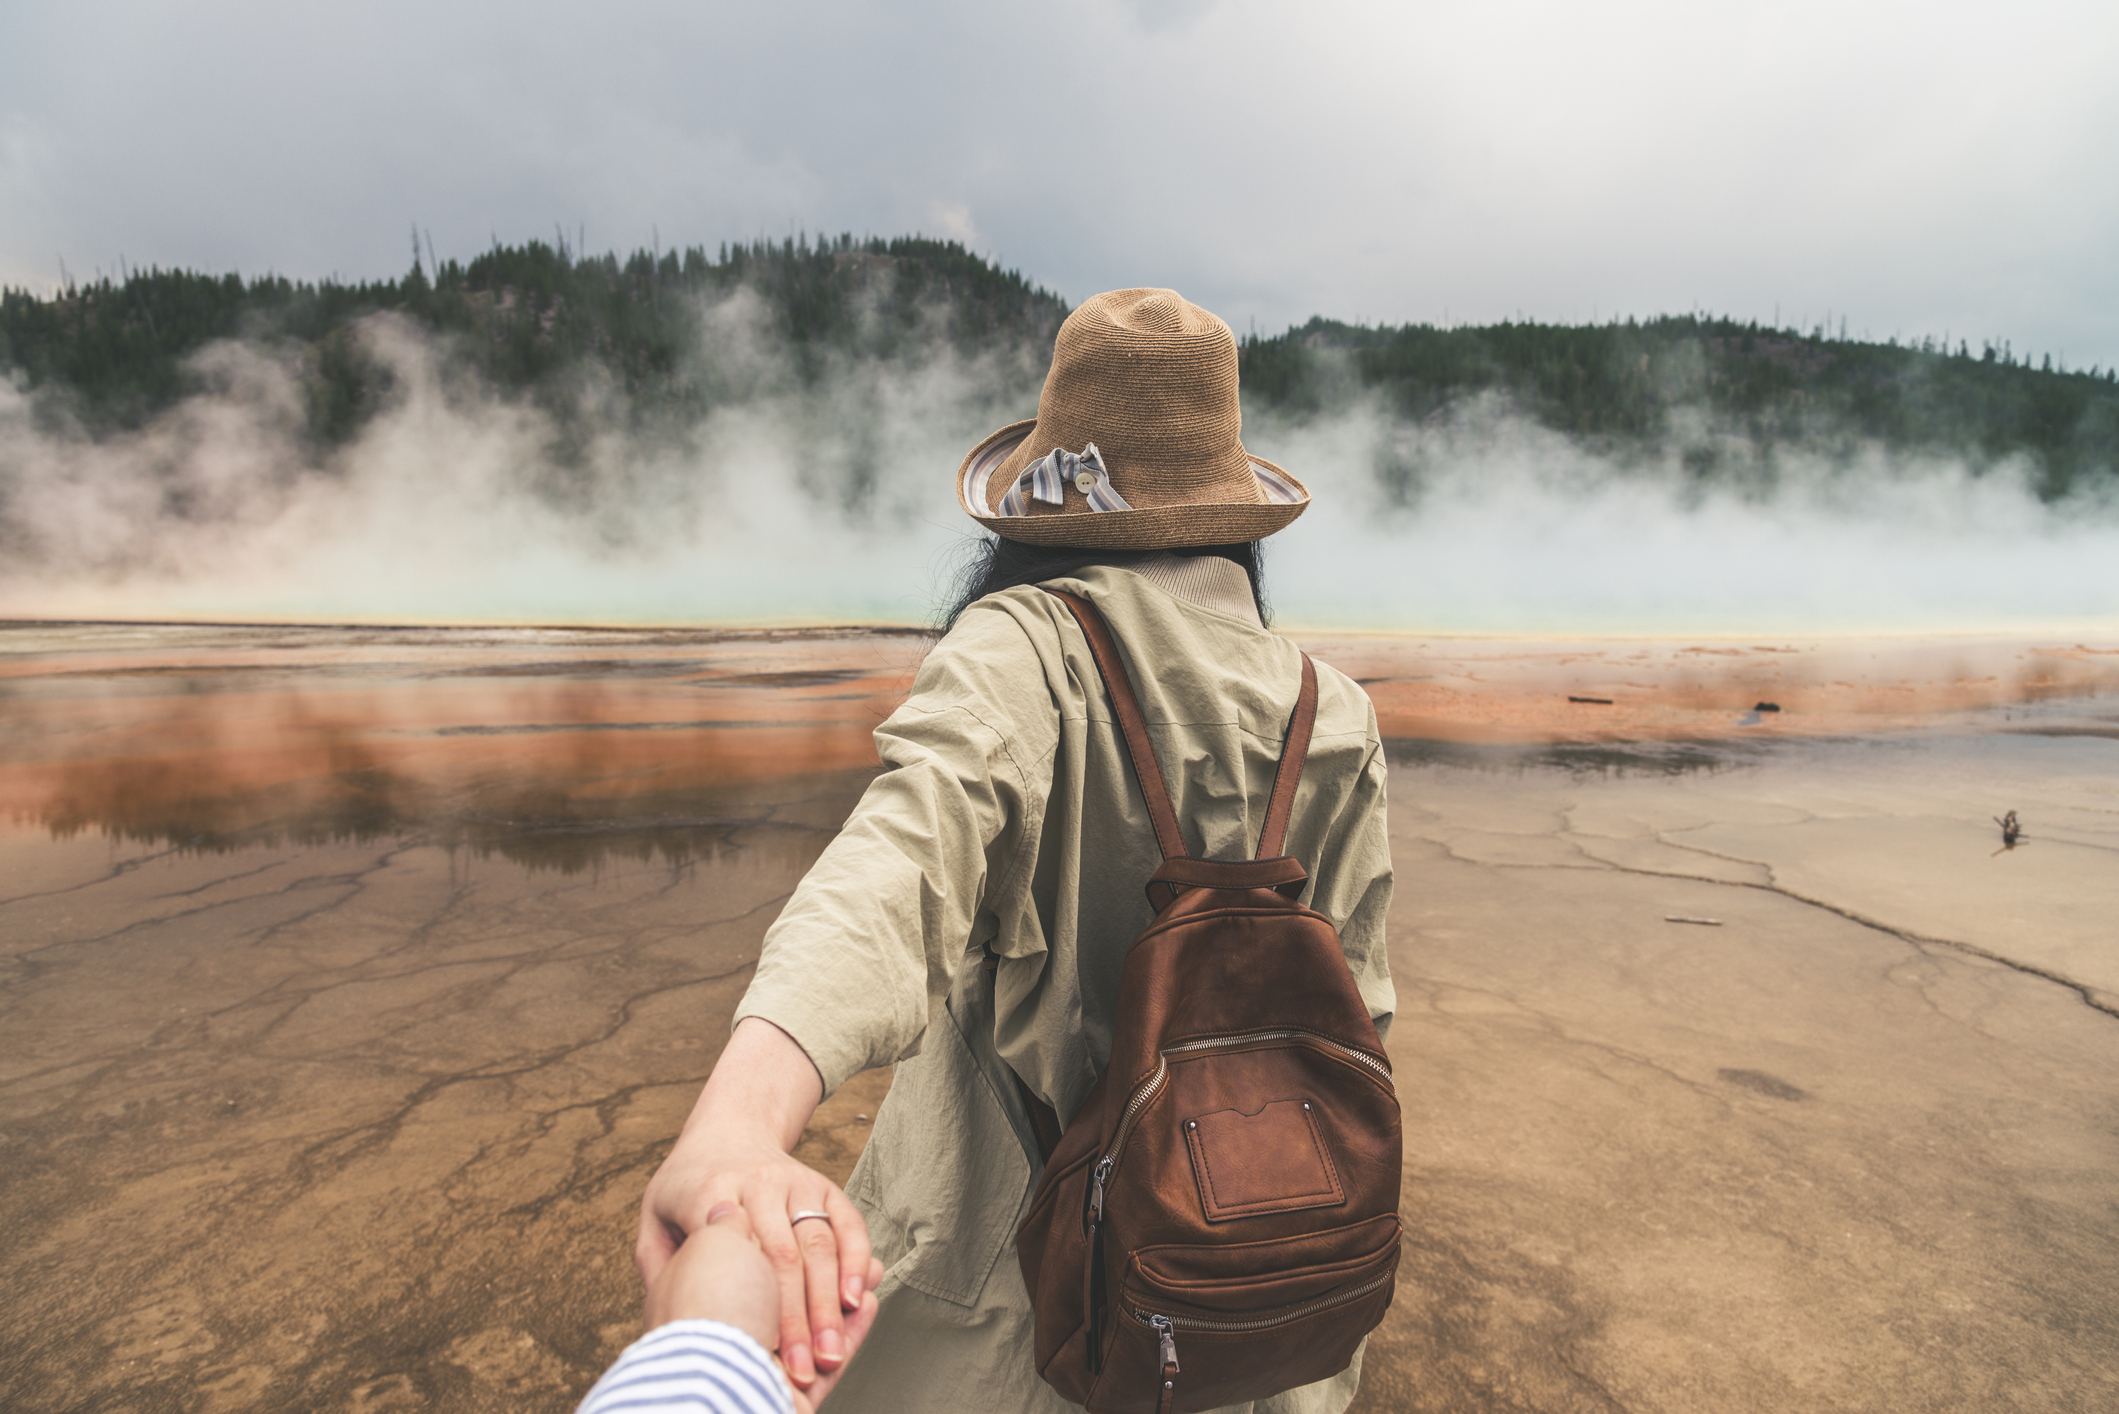 5 Reasons to Avoid Yellowstone National Park